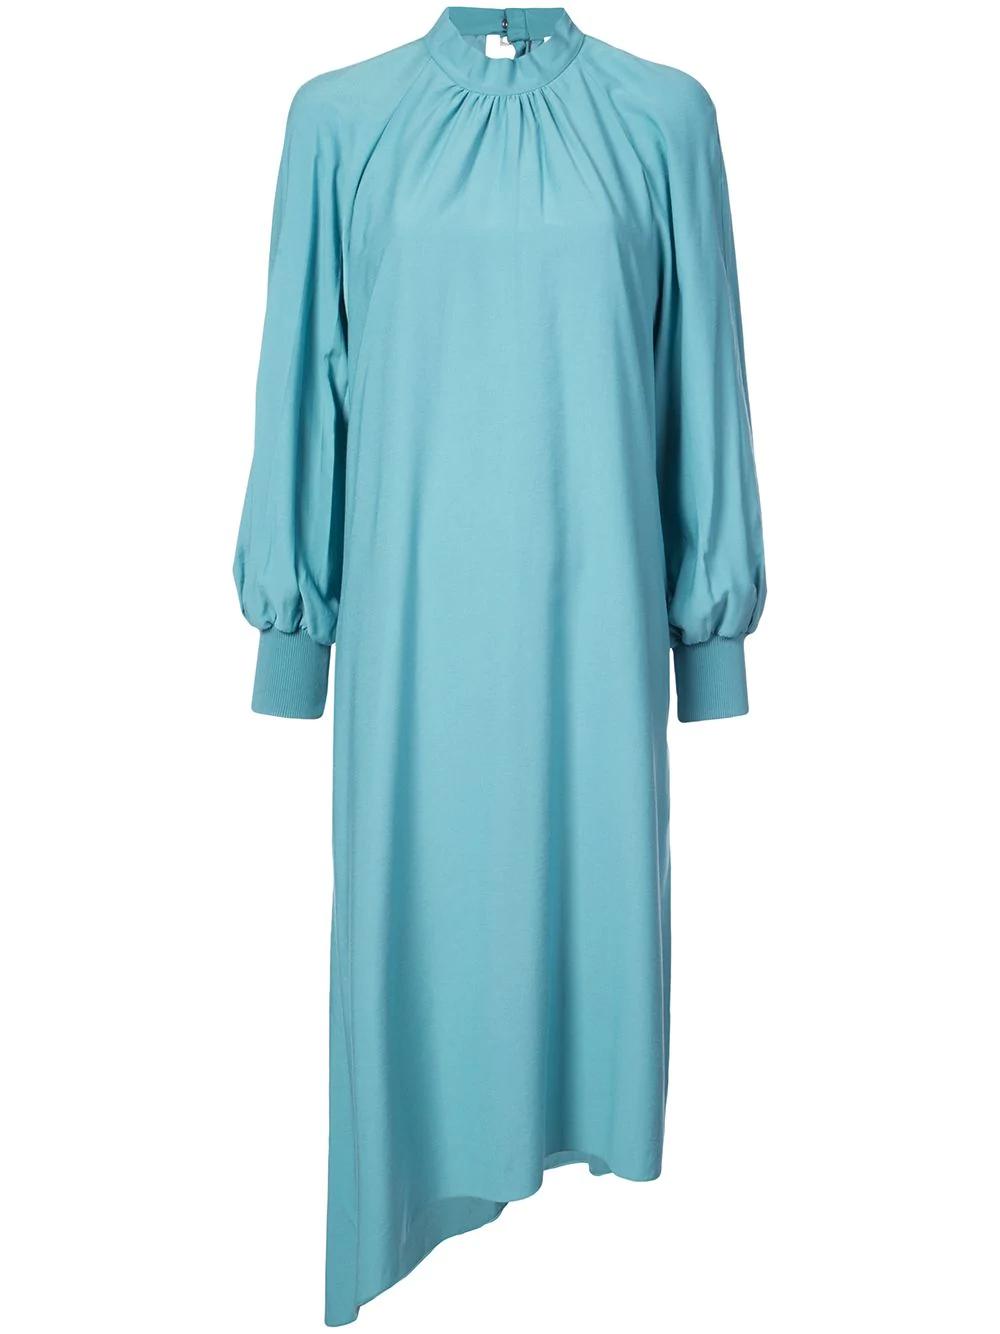 Tibi Buckle Asymmetrical Dress In Blue